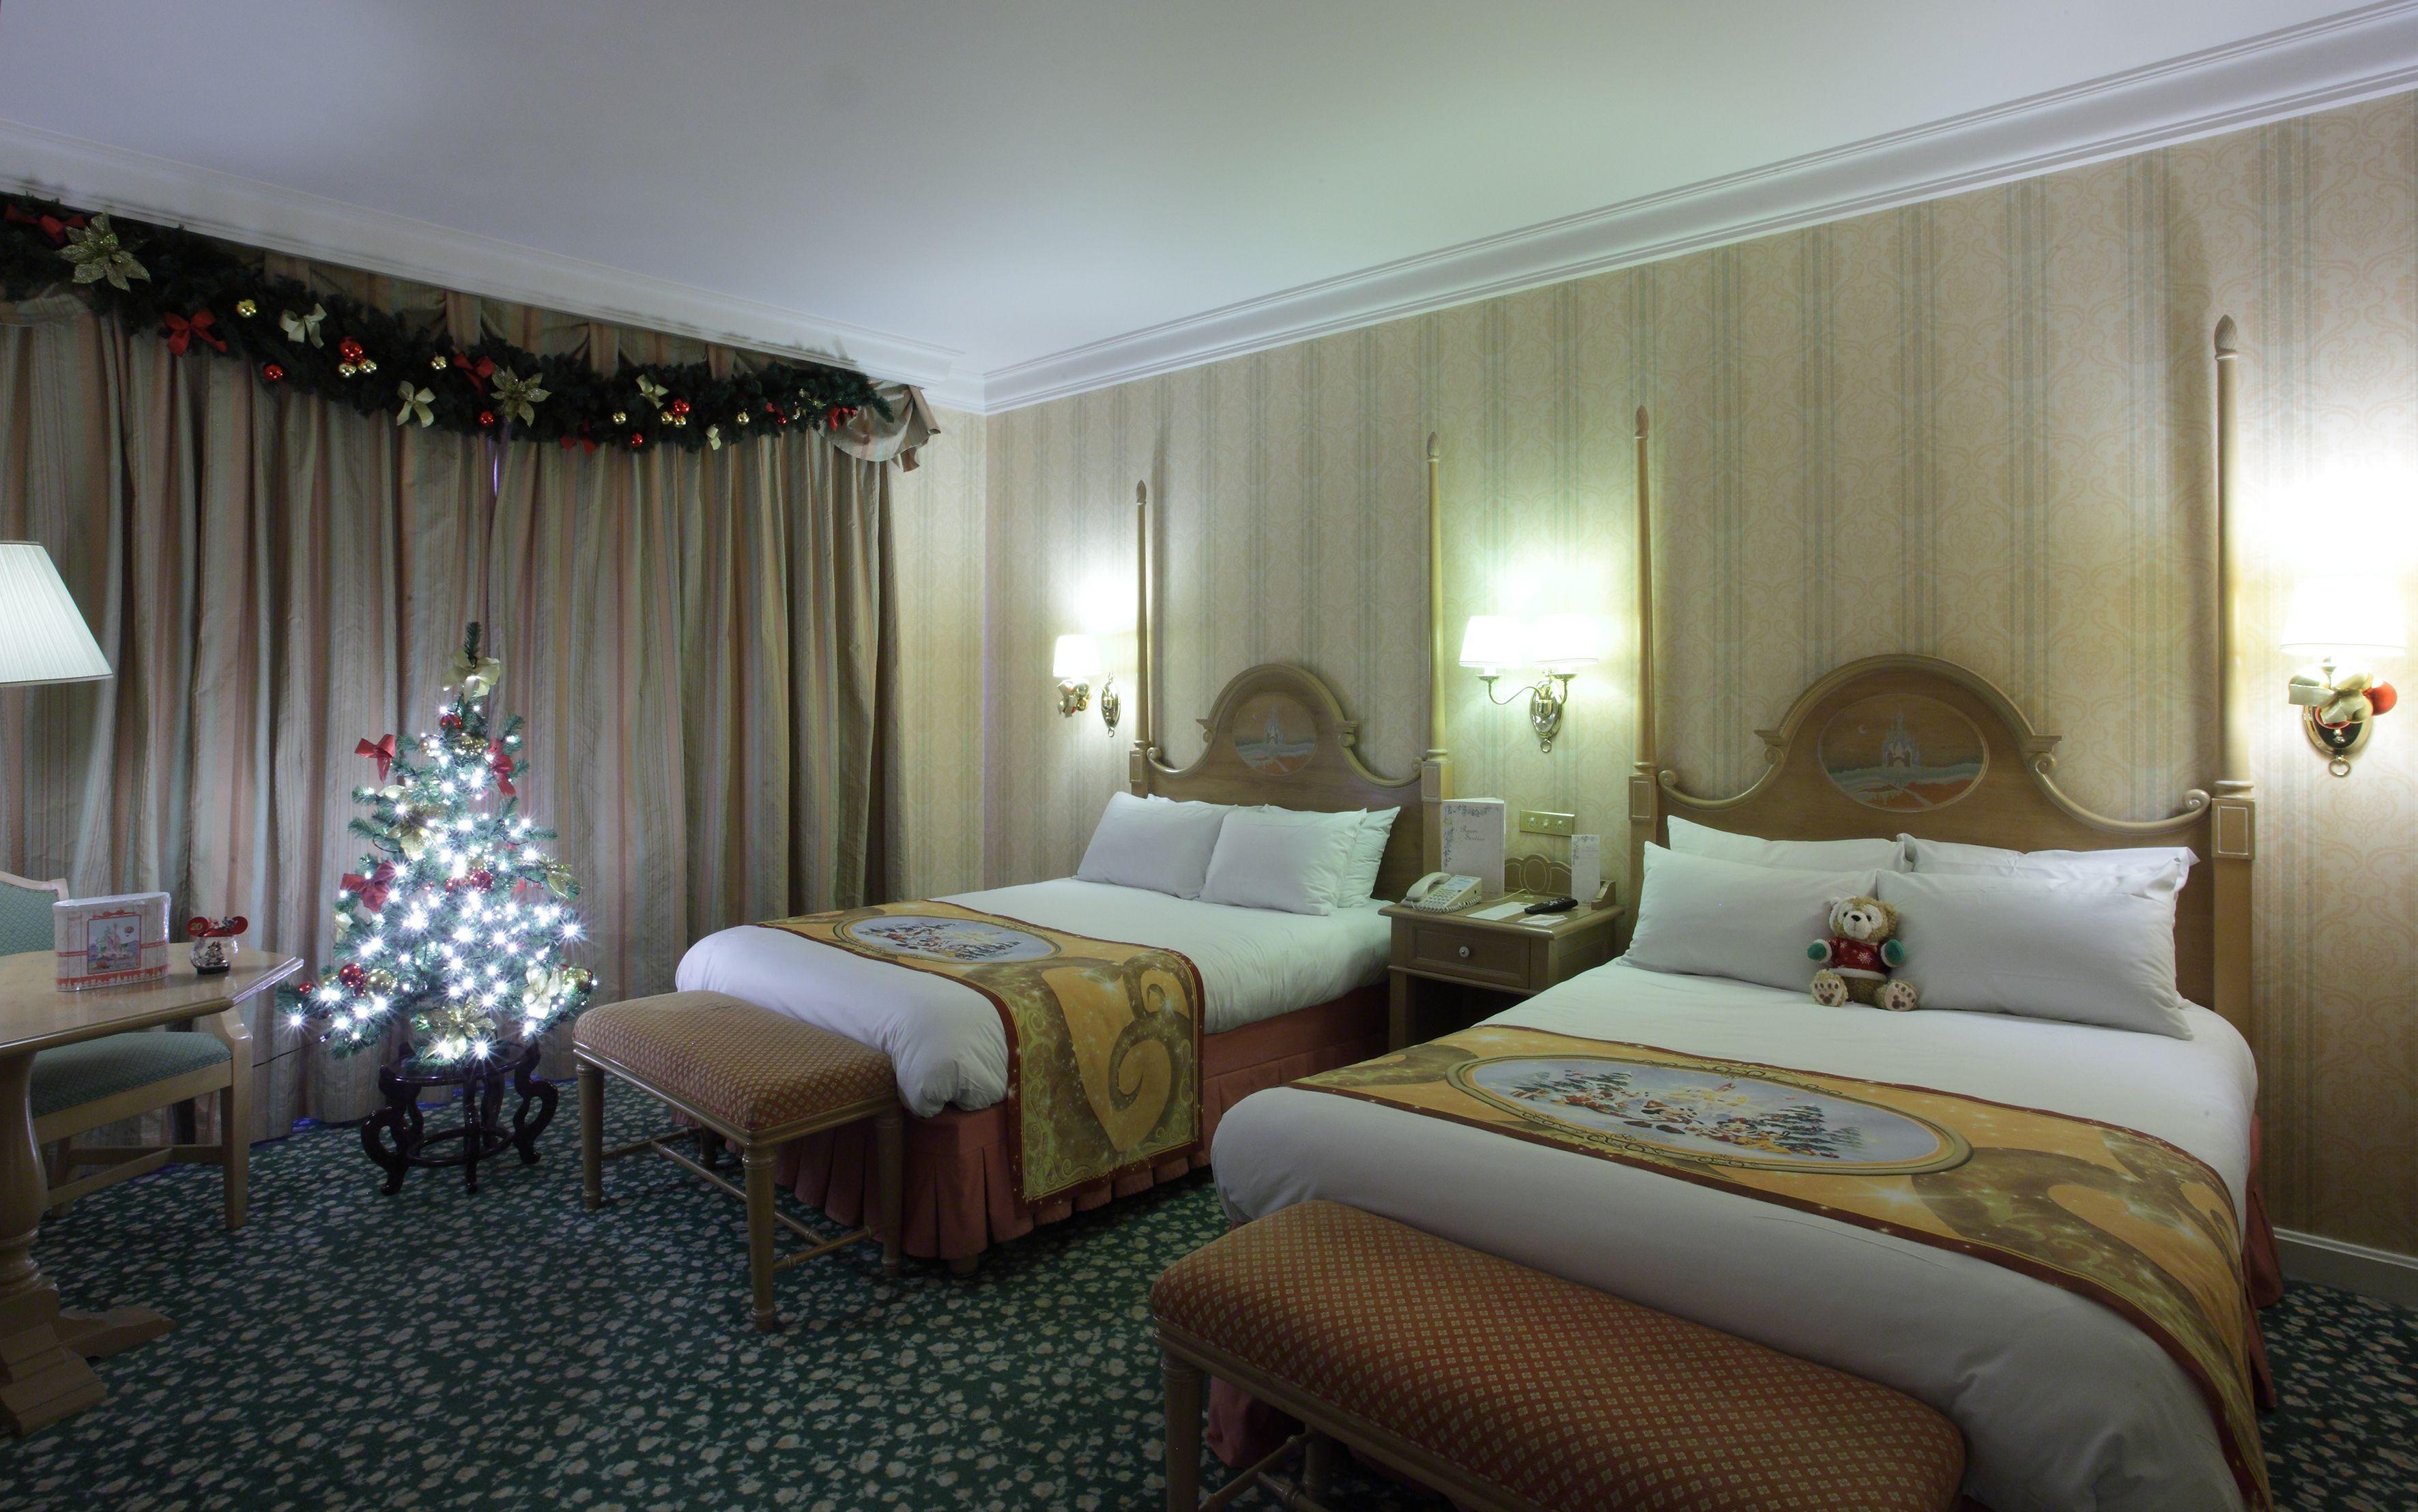 Disney Hotels Disneyland Hotel - Christmas Themed Room